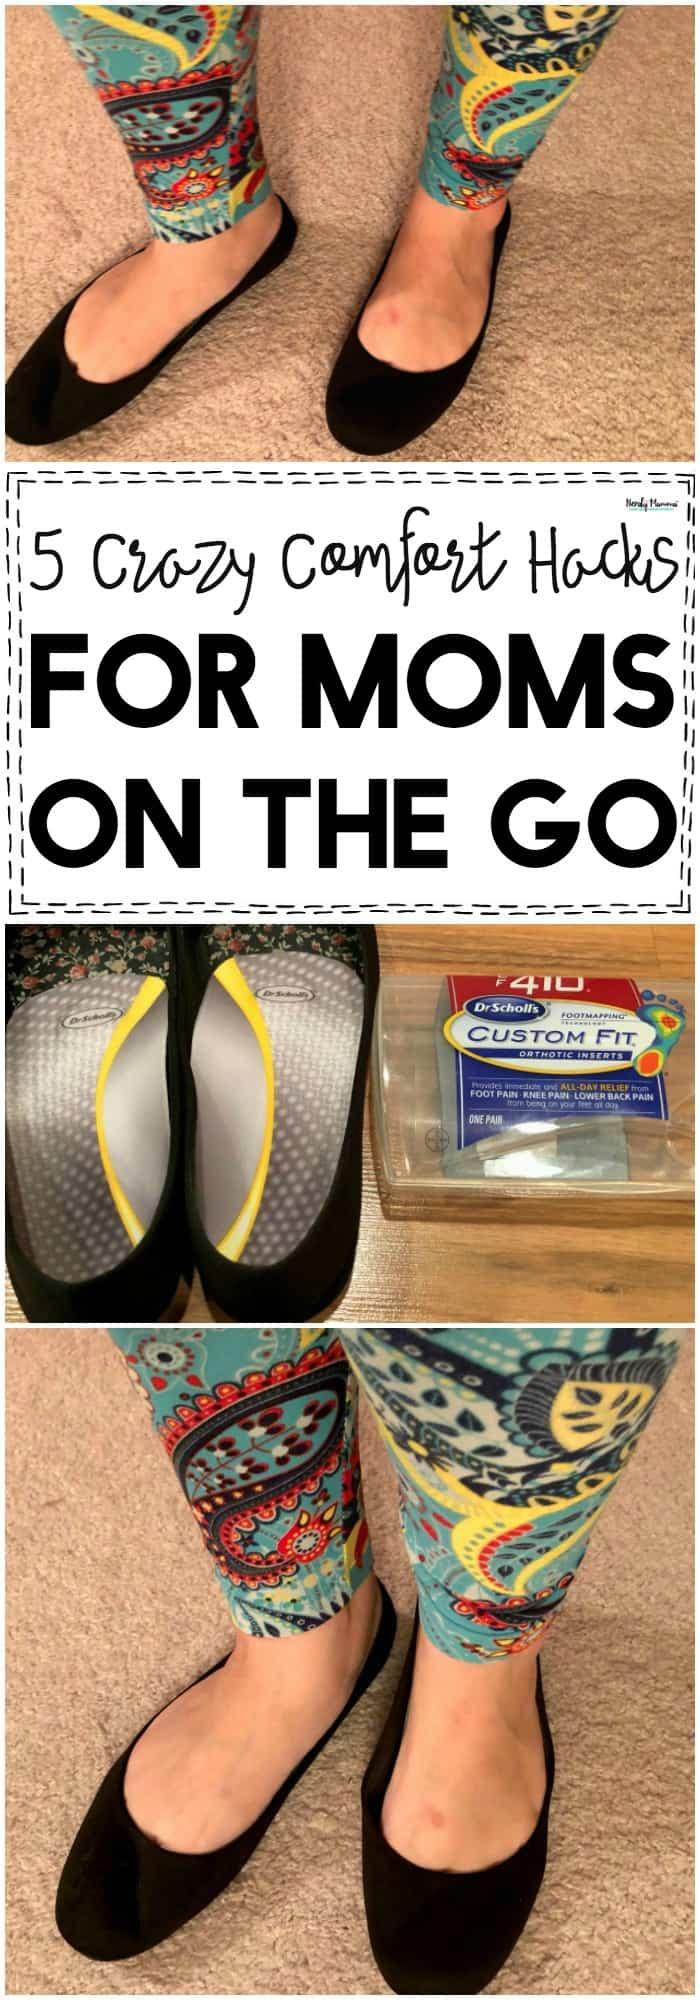 5 Crazy Comfort Hacks for Moms on the Go